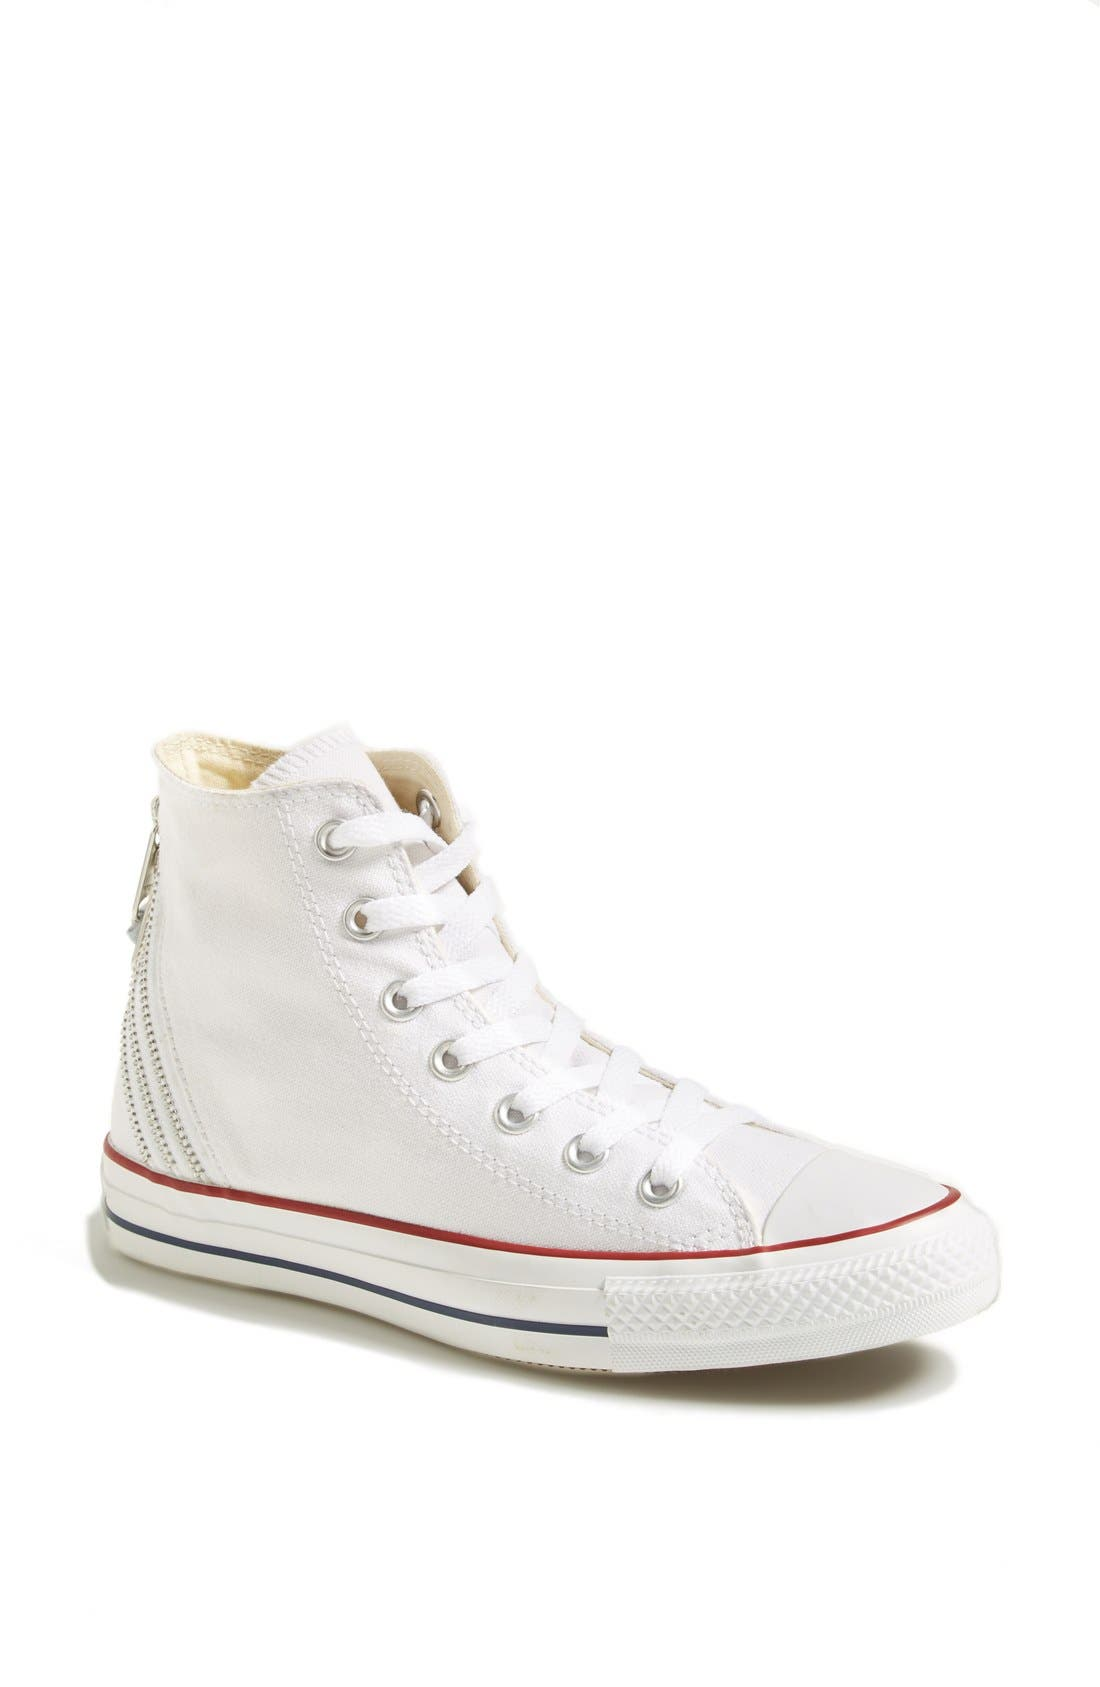 Main Image - Converse Chuck Taylor® All Star® Triple Zip Canvas Sneaker (Women)